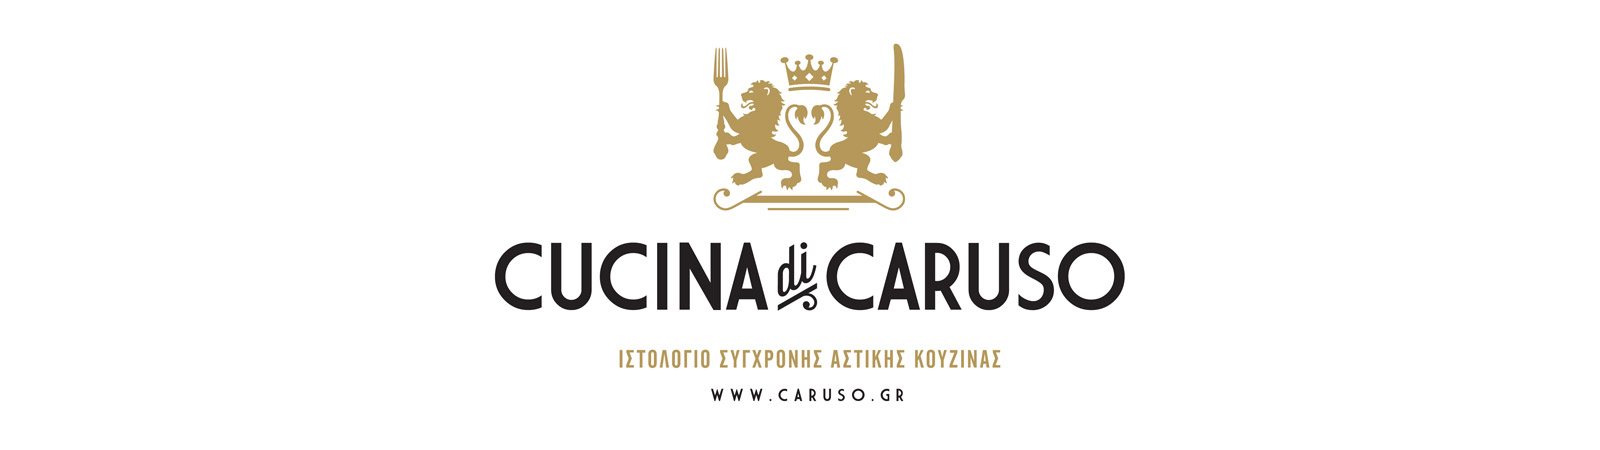 Caruso.gr - Σπιτική Μαγειρική,  Επιλεγμένα Υλικά, Επιστήμη της Γεύσης και Τέχνη της Απόλαυσης